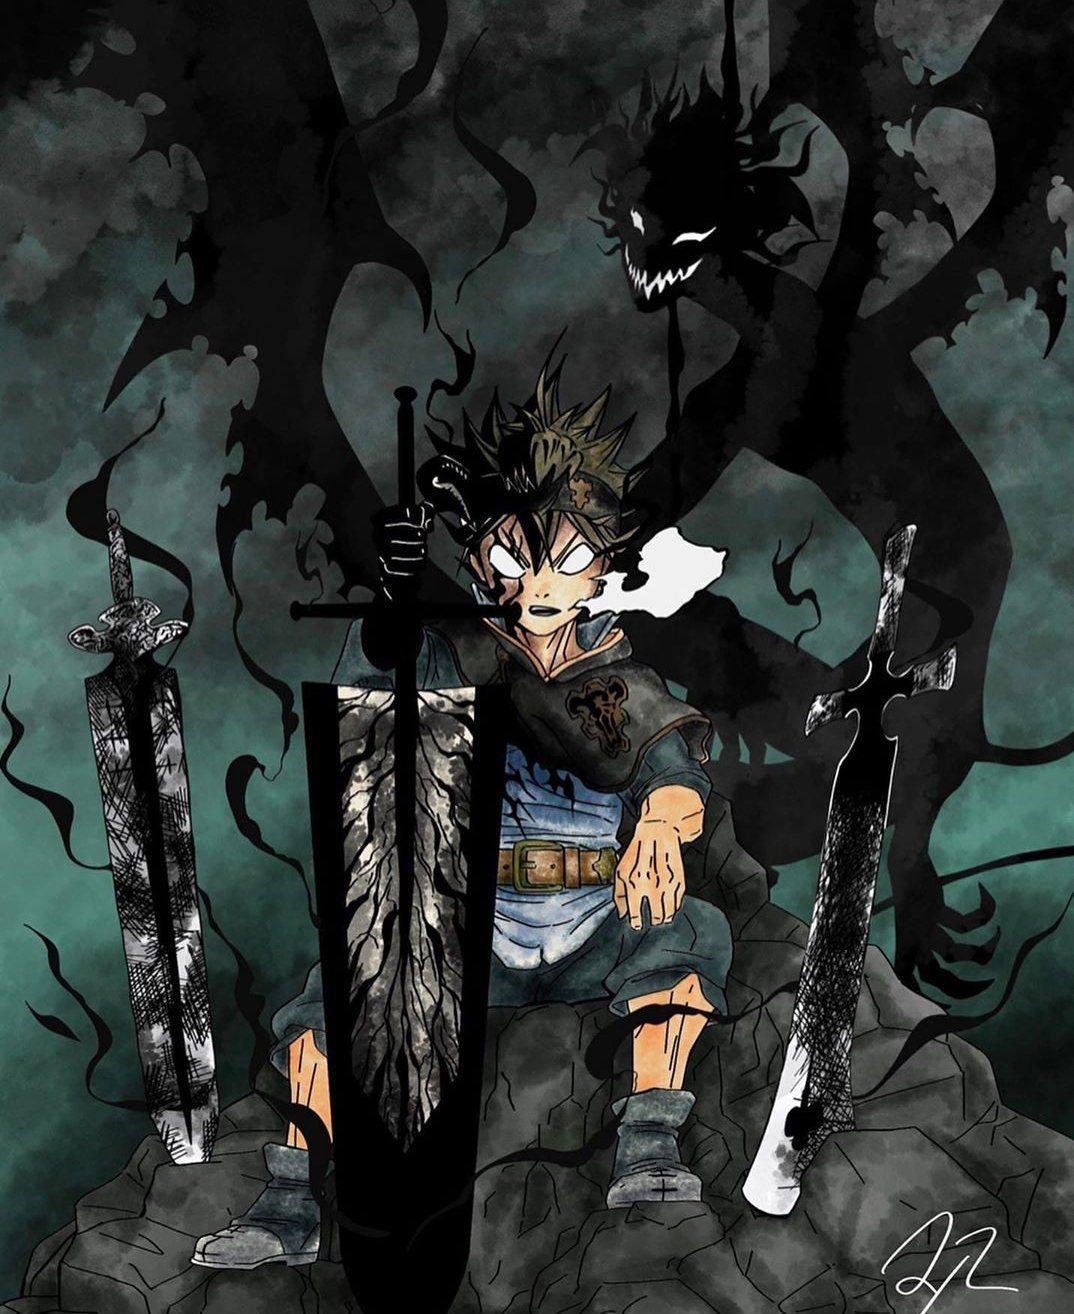 Black Clover Iblis Asta Wallpapers - Wallpaper Cave